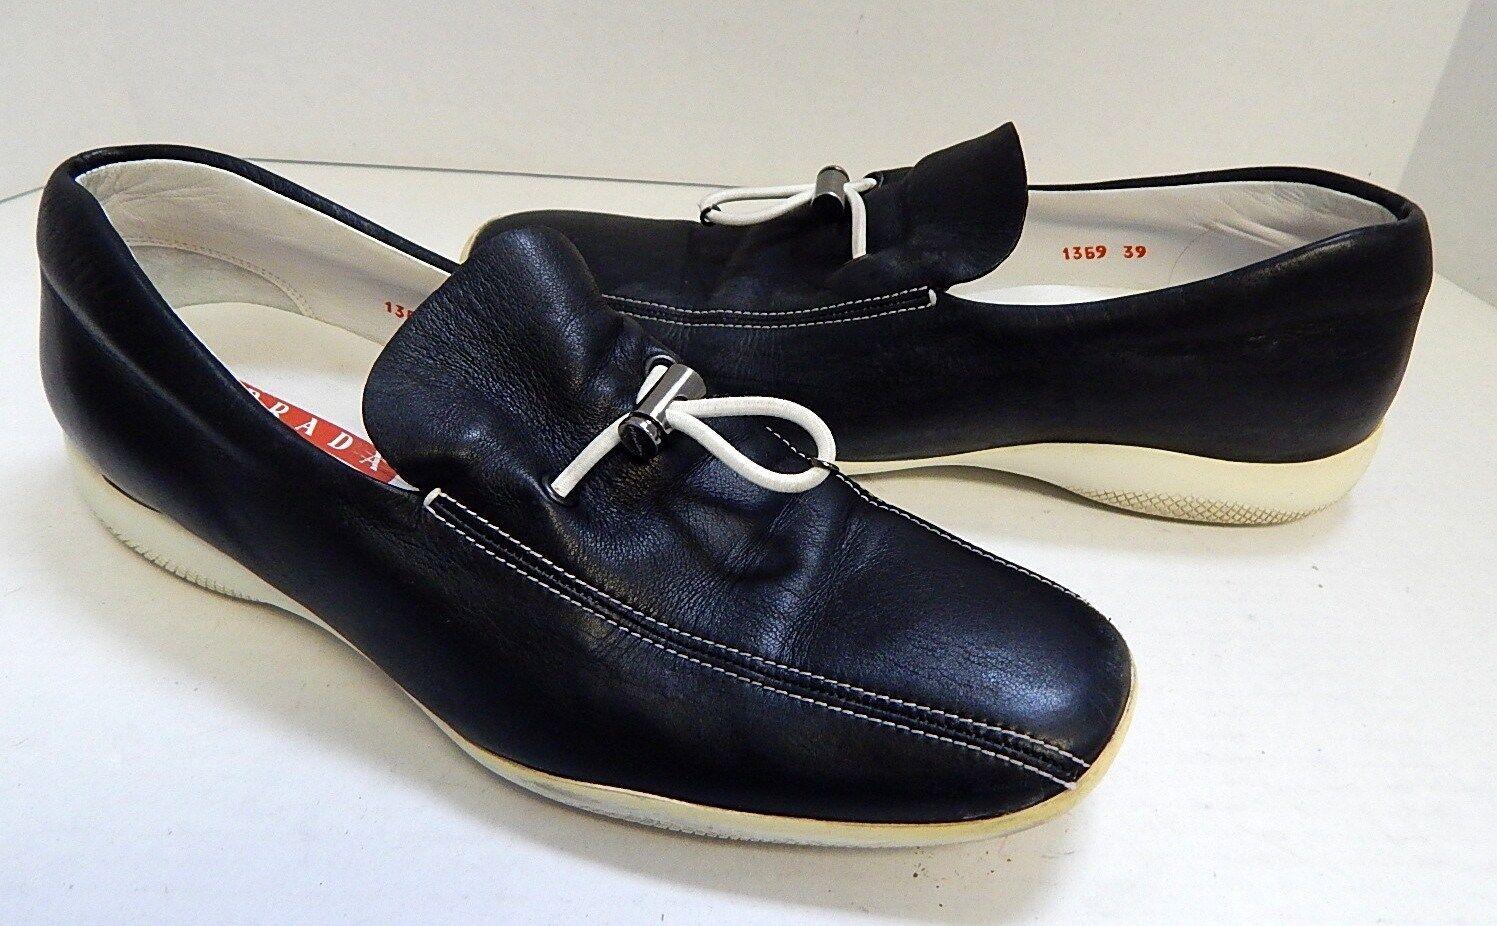 Prada 39 8.5M Navy Blau Leder Toggle Sneakers Loafers